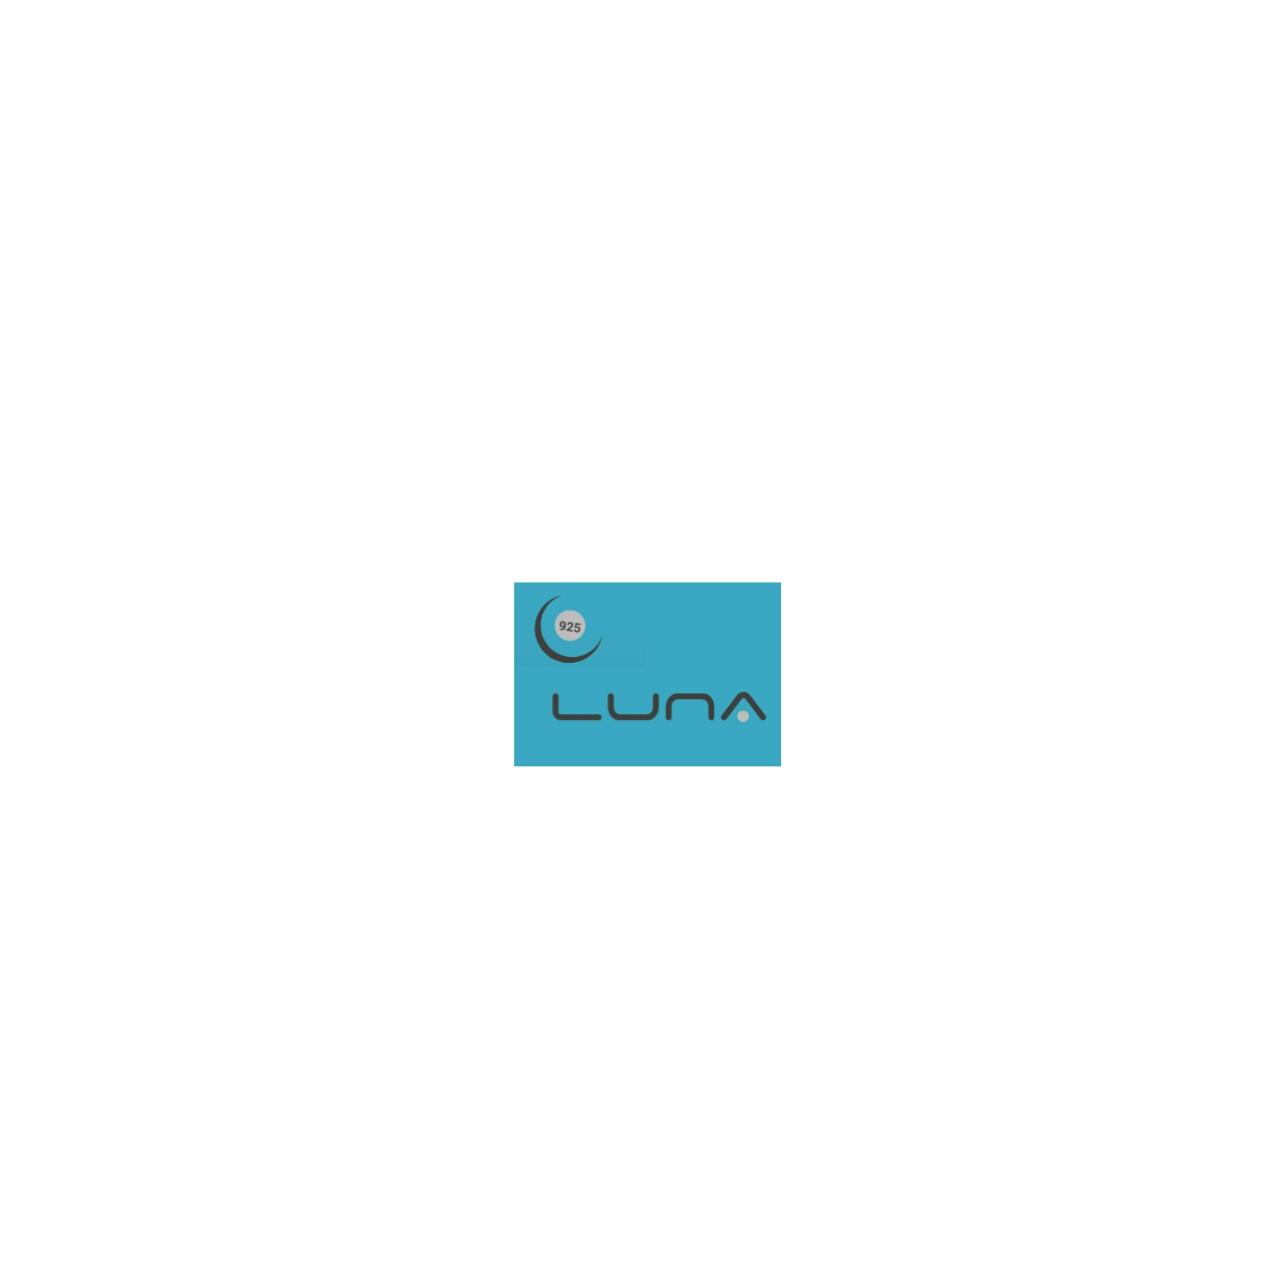 Логотип для столового серебра и посуды из серебра фото f_9045babc1aec79bb.jpg